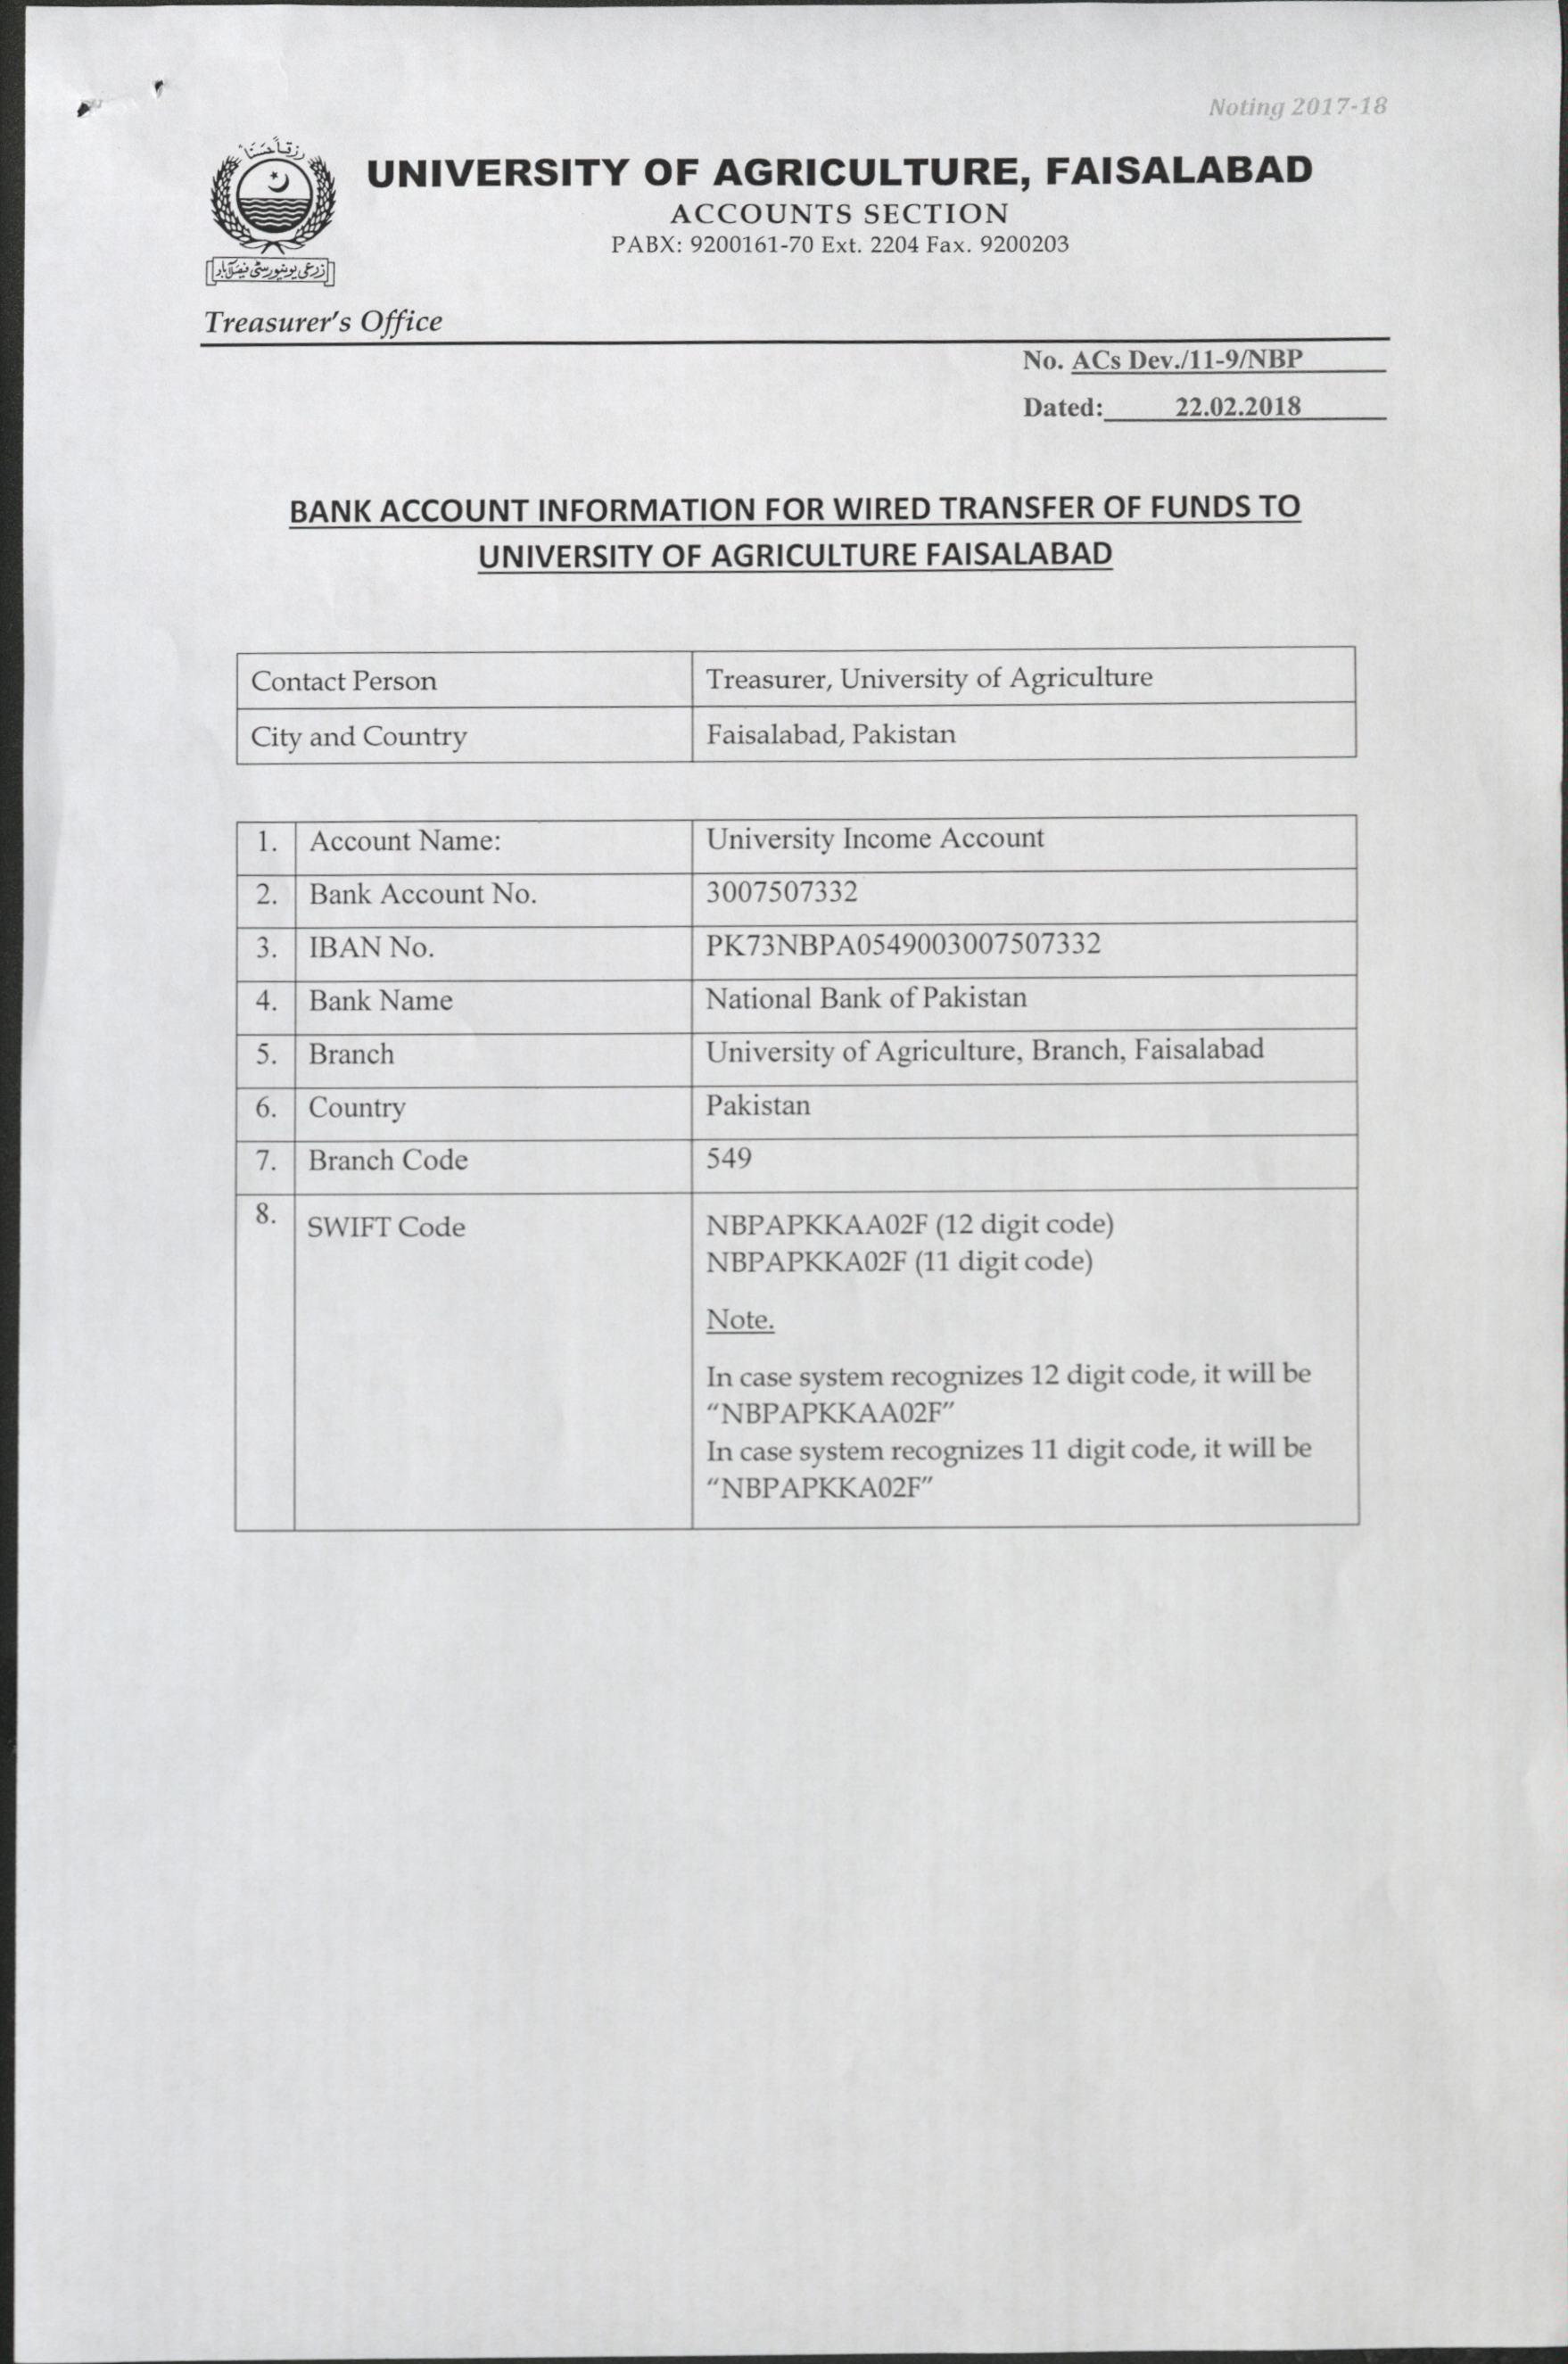 University of Agriculture, Faisalabad, Pakistan -> Downloads